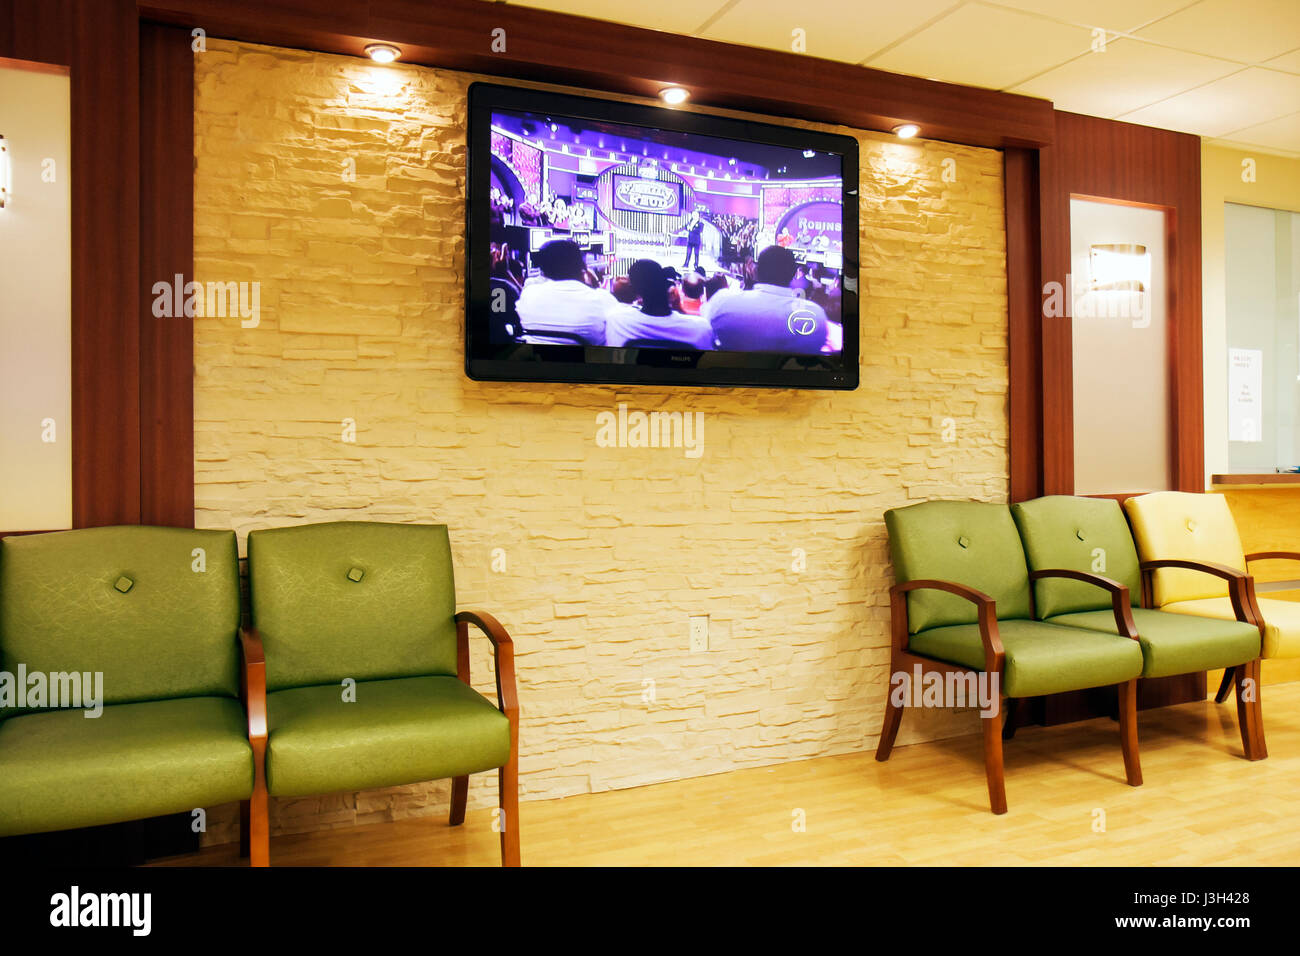 Chaises Salle D Attente Cabinet Medical miami beach florida mt. l'hôpital mount sinai medical center